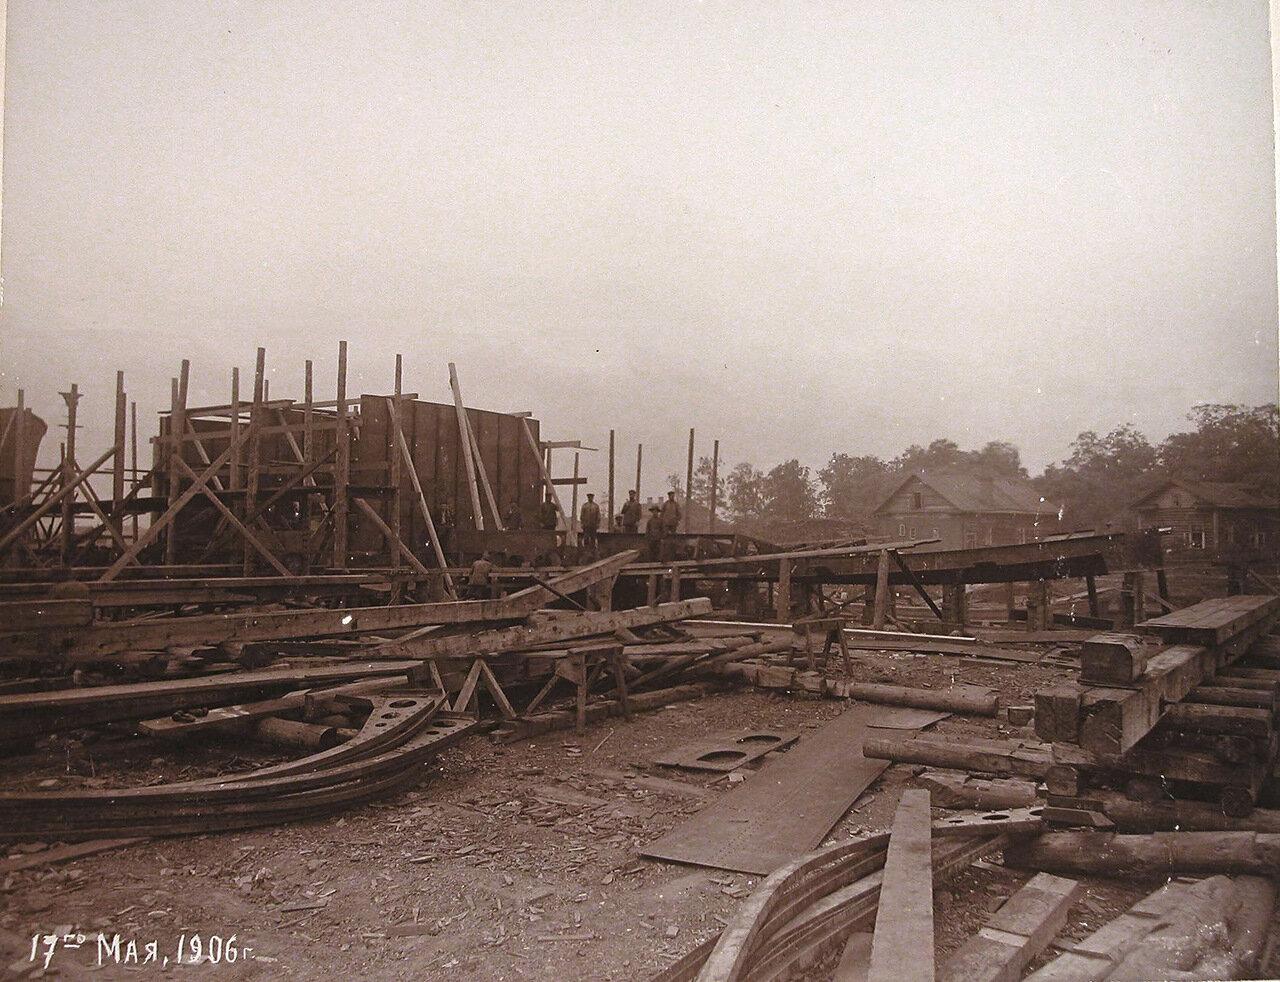 20.  Постройка канонерской лодки «Кореец» на стапеле Путиловского завода. 17 мая 1906